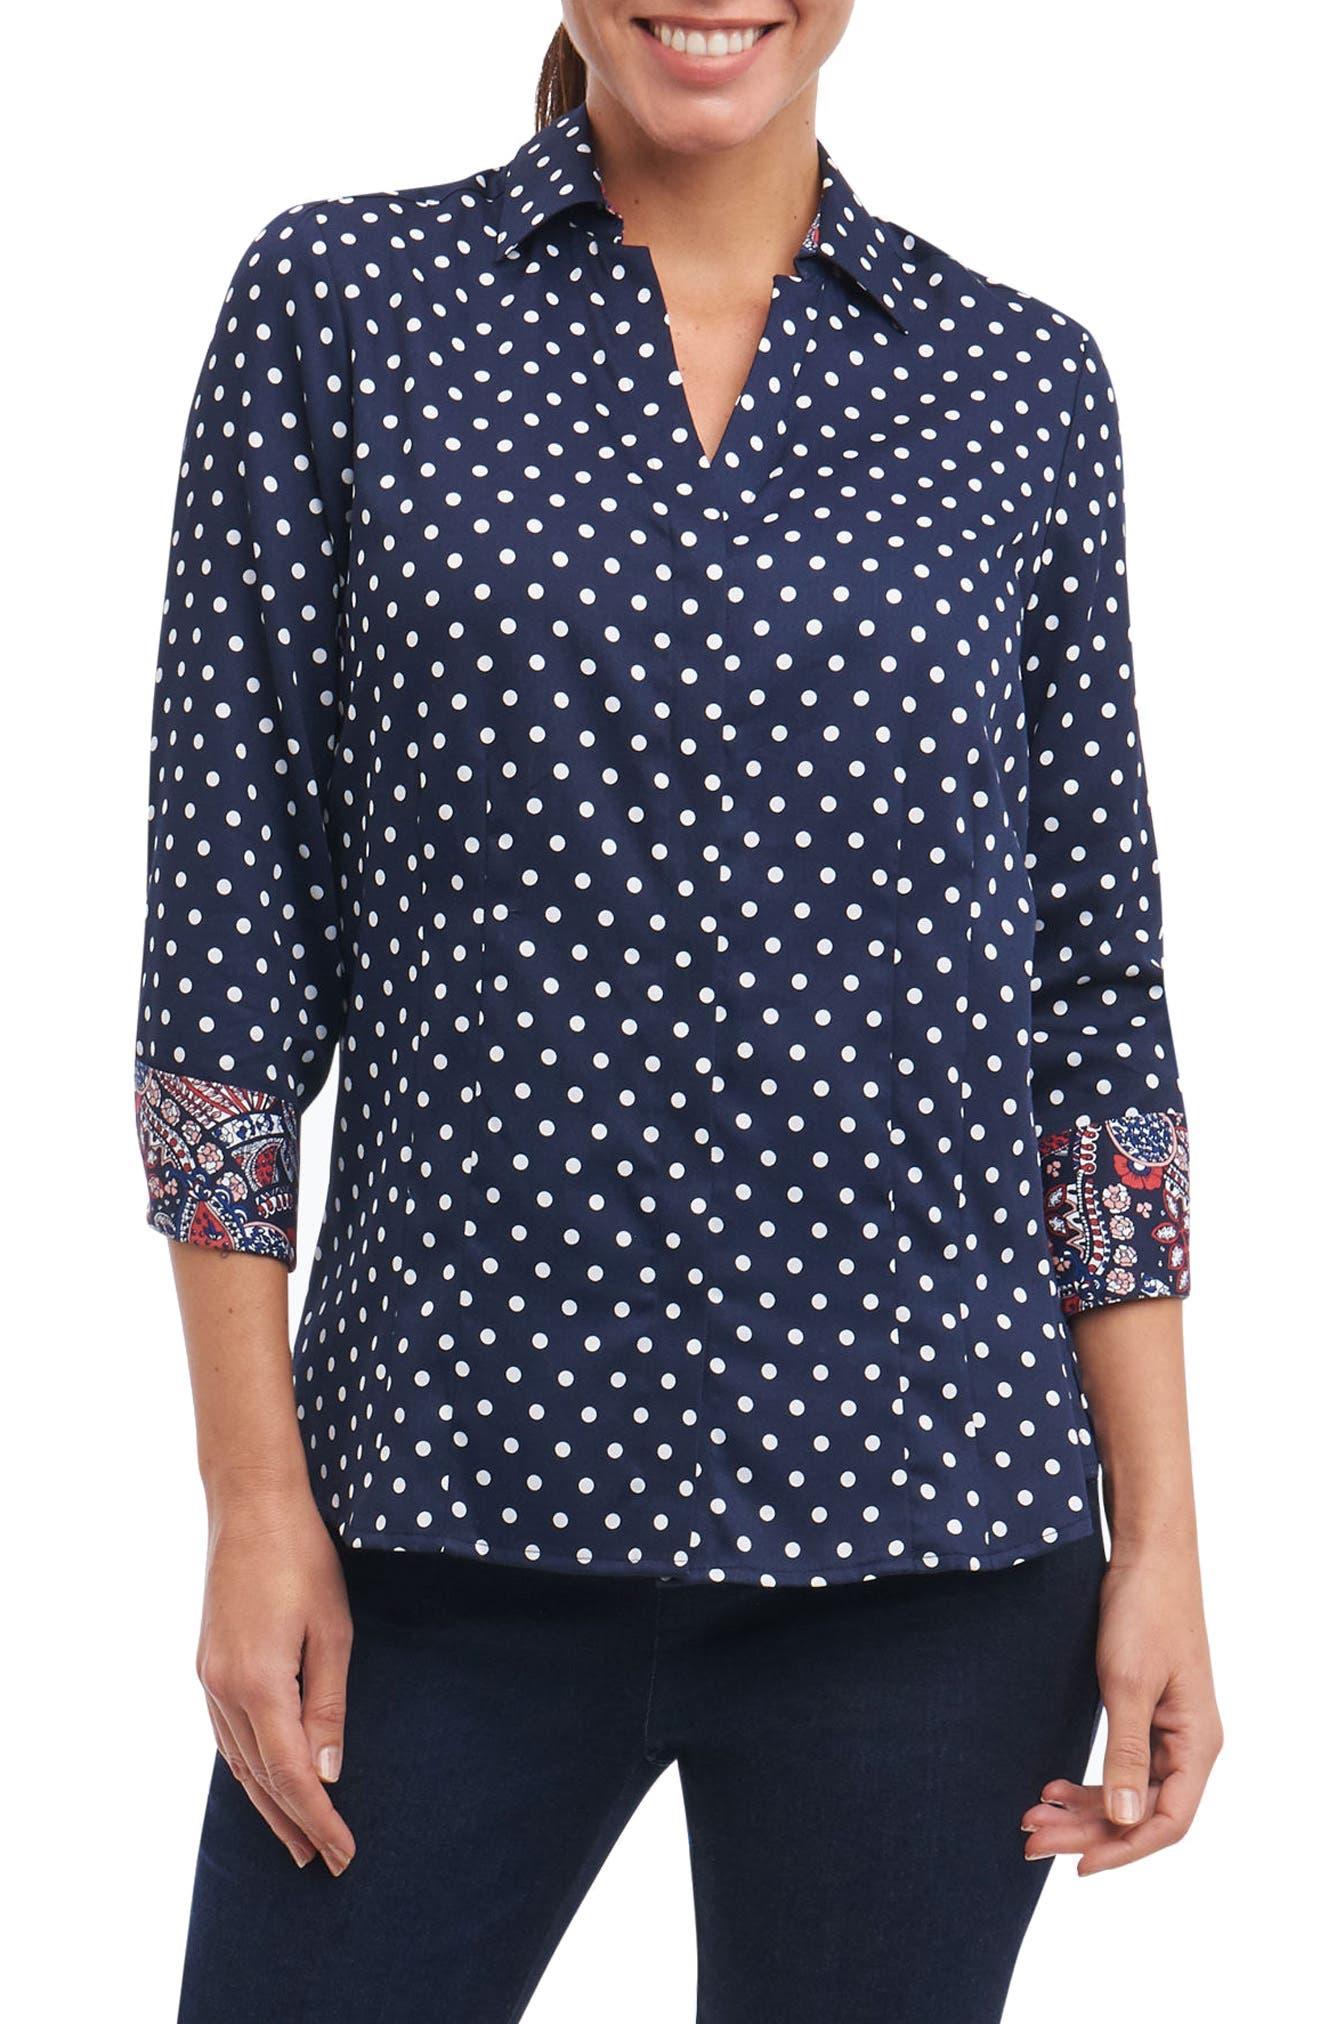 Taylor Classic Dot Non-Iron Cotton Shirt,                         Main,                         color,